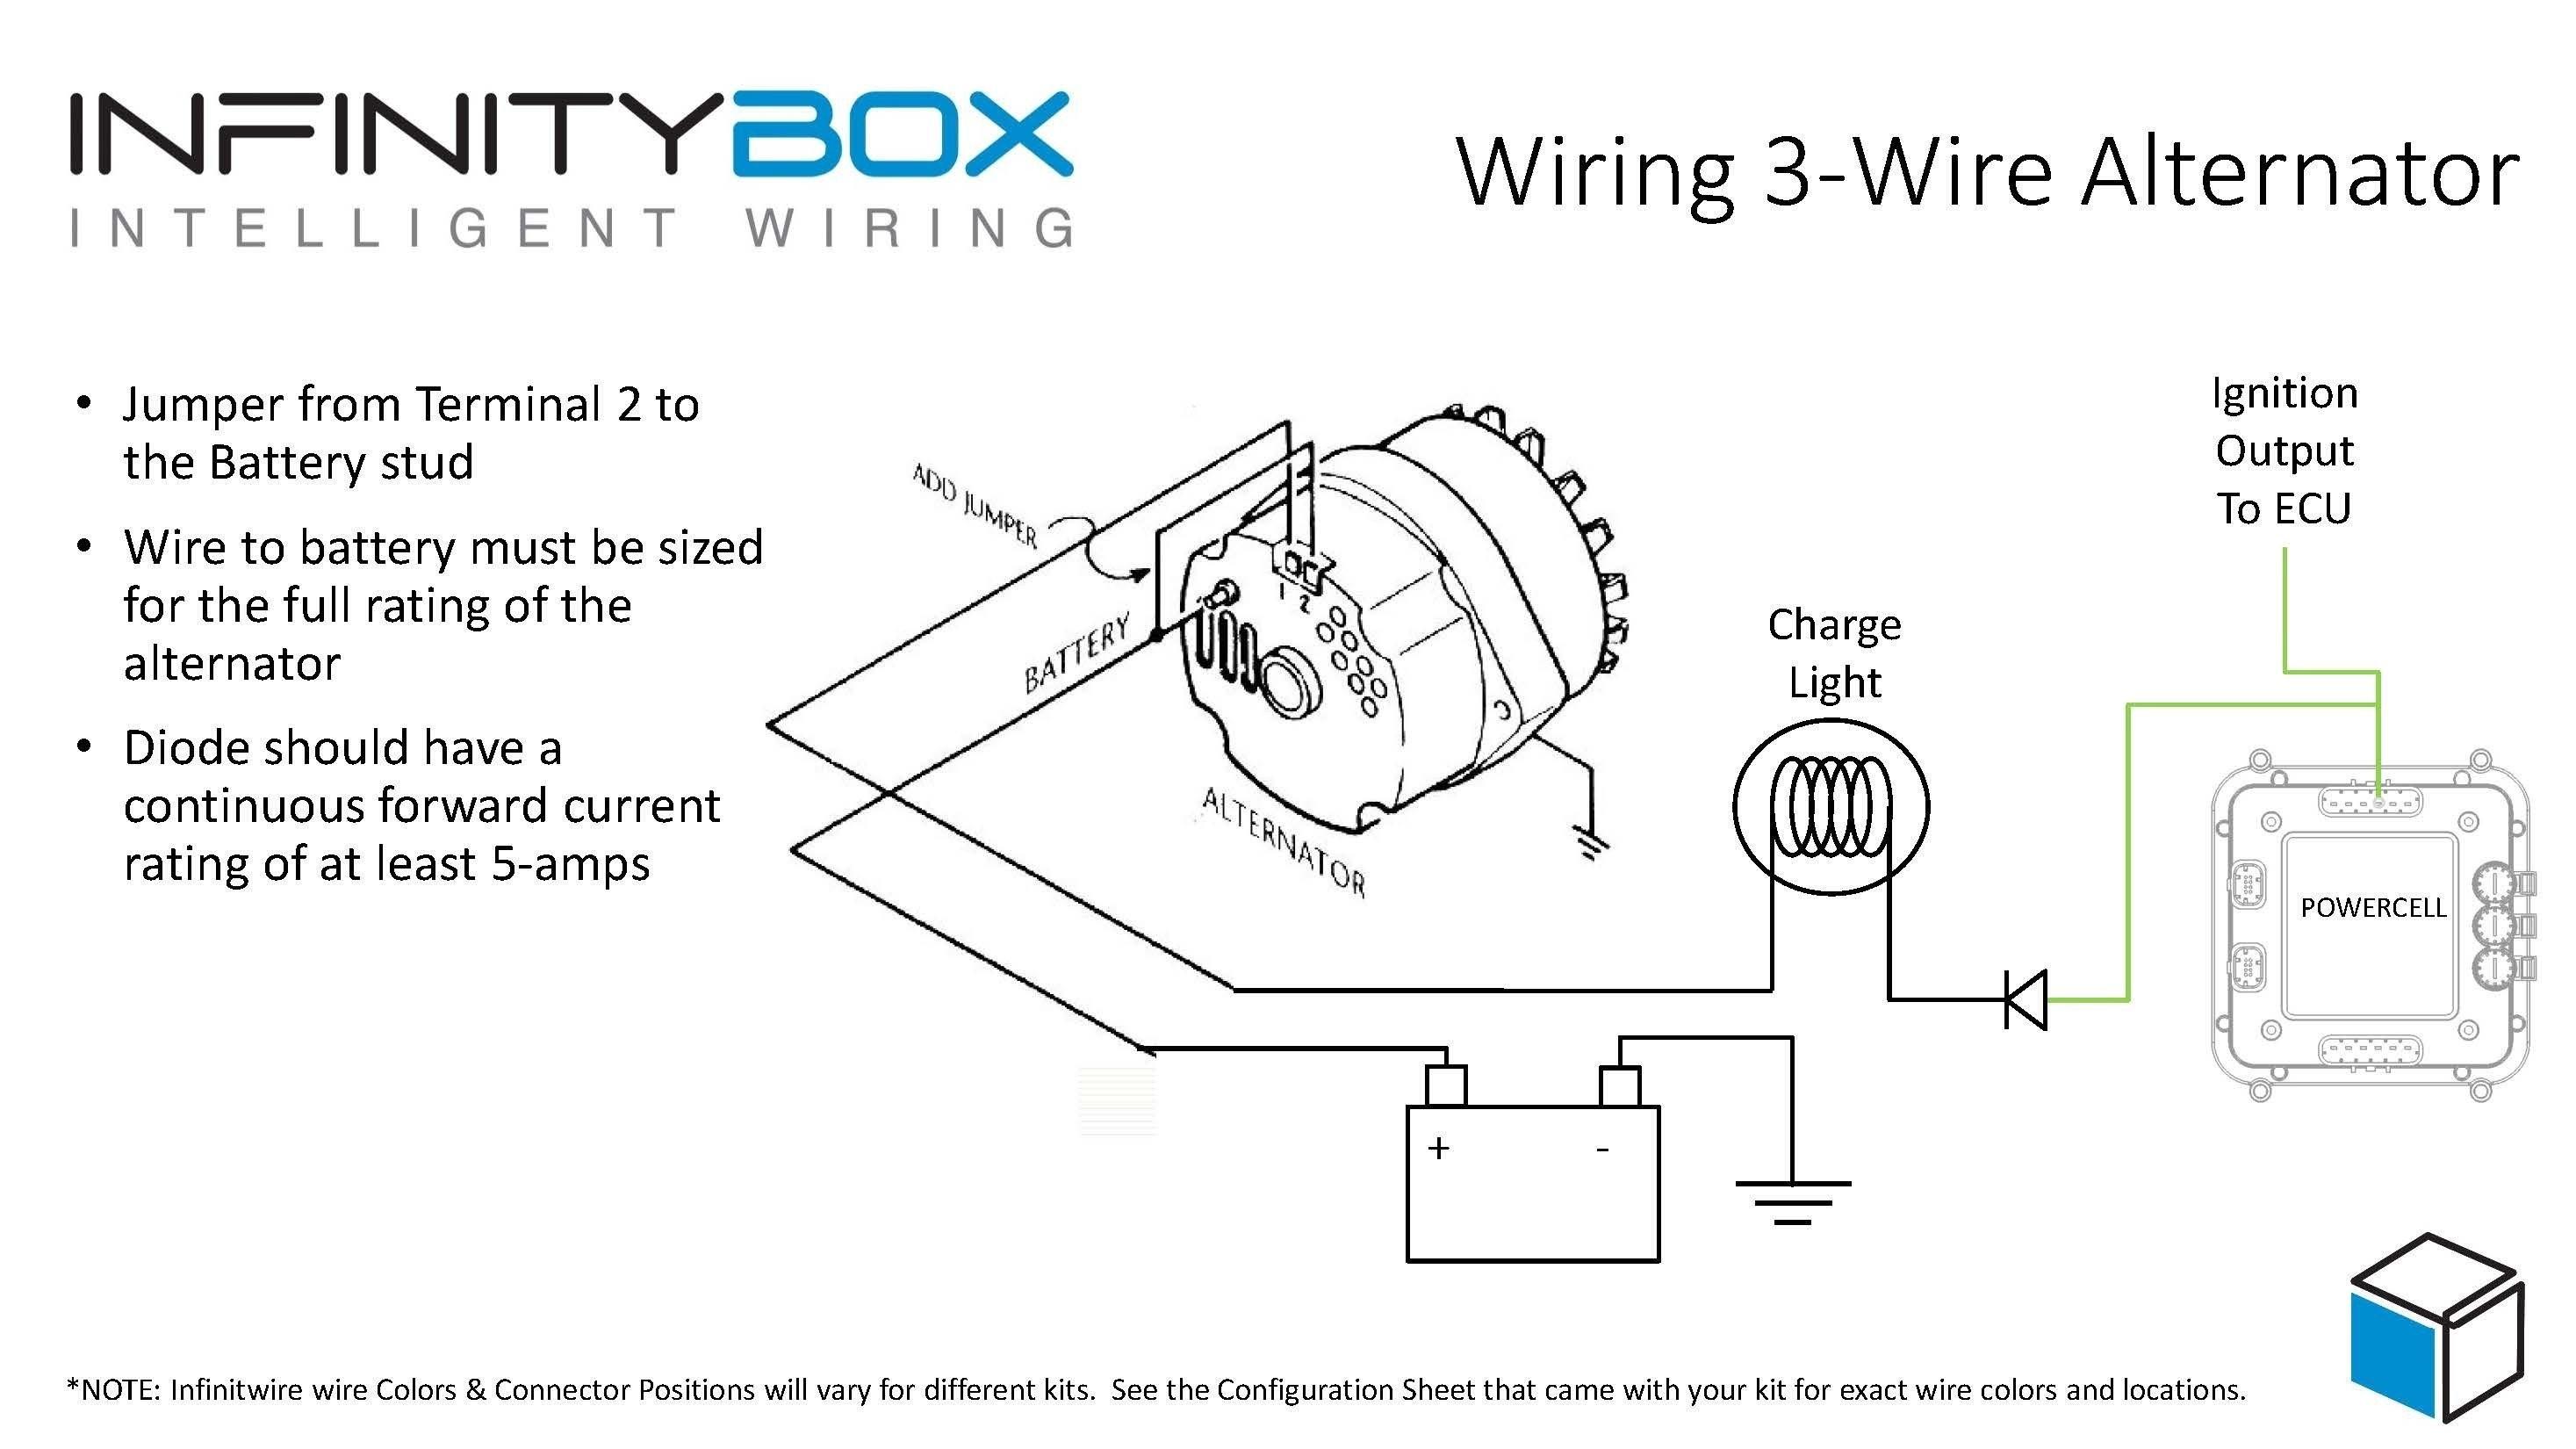 1985 chevy alternator wiring dt 4778  alternator wiring diagram moreover 3 wire delco  alternator wiring diagram moreover 3